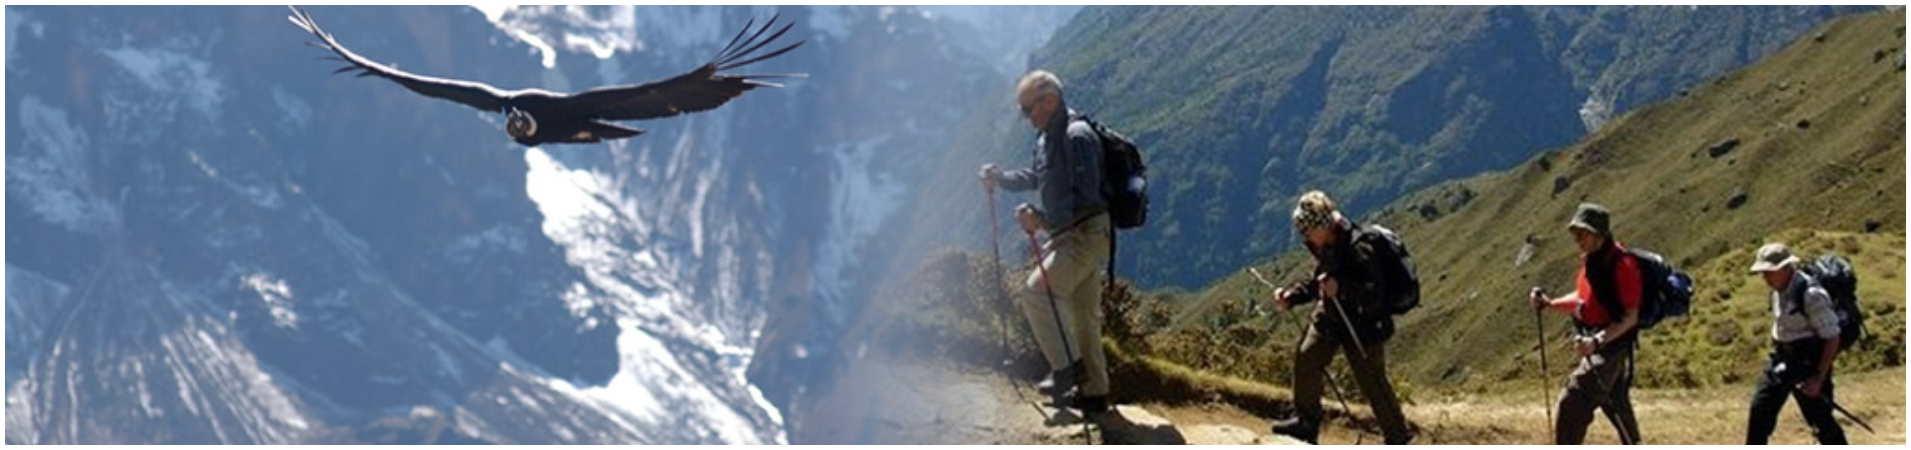 Tours al Cañón del Colca 2 días qori inka travel agency